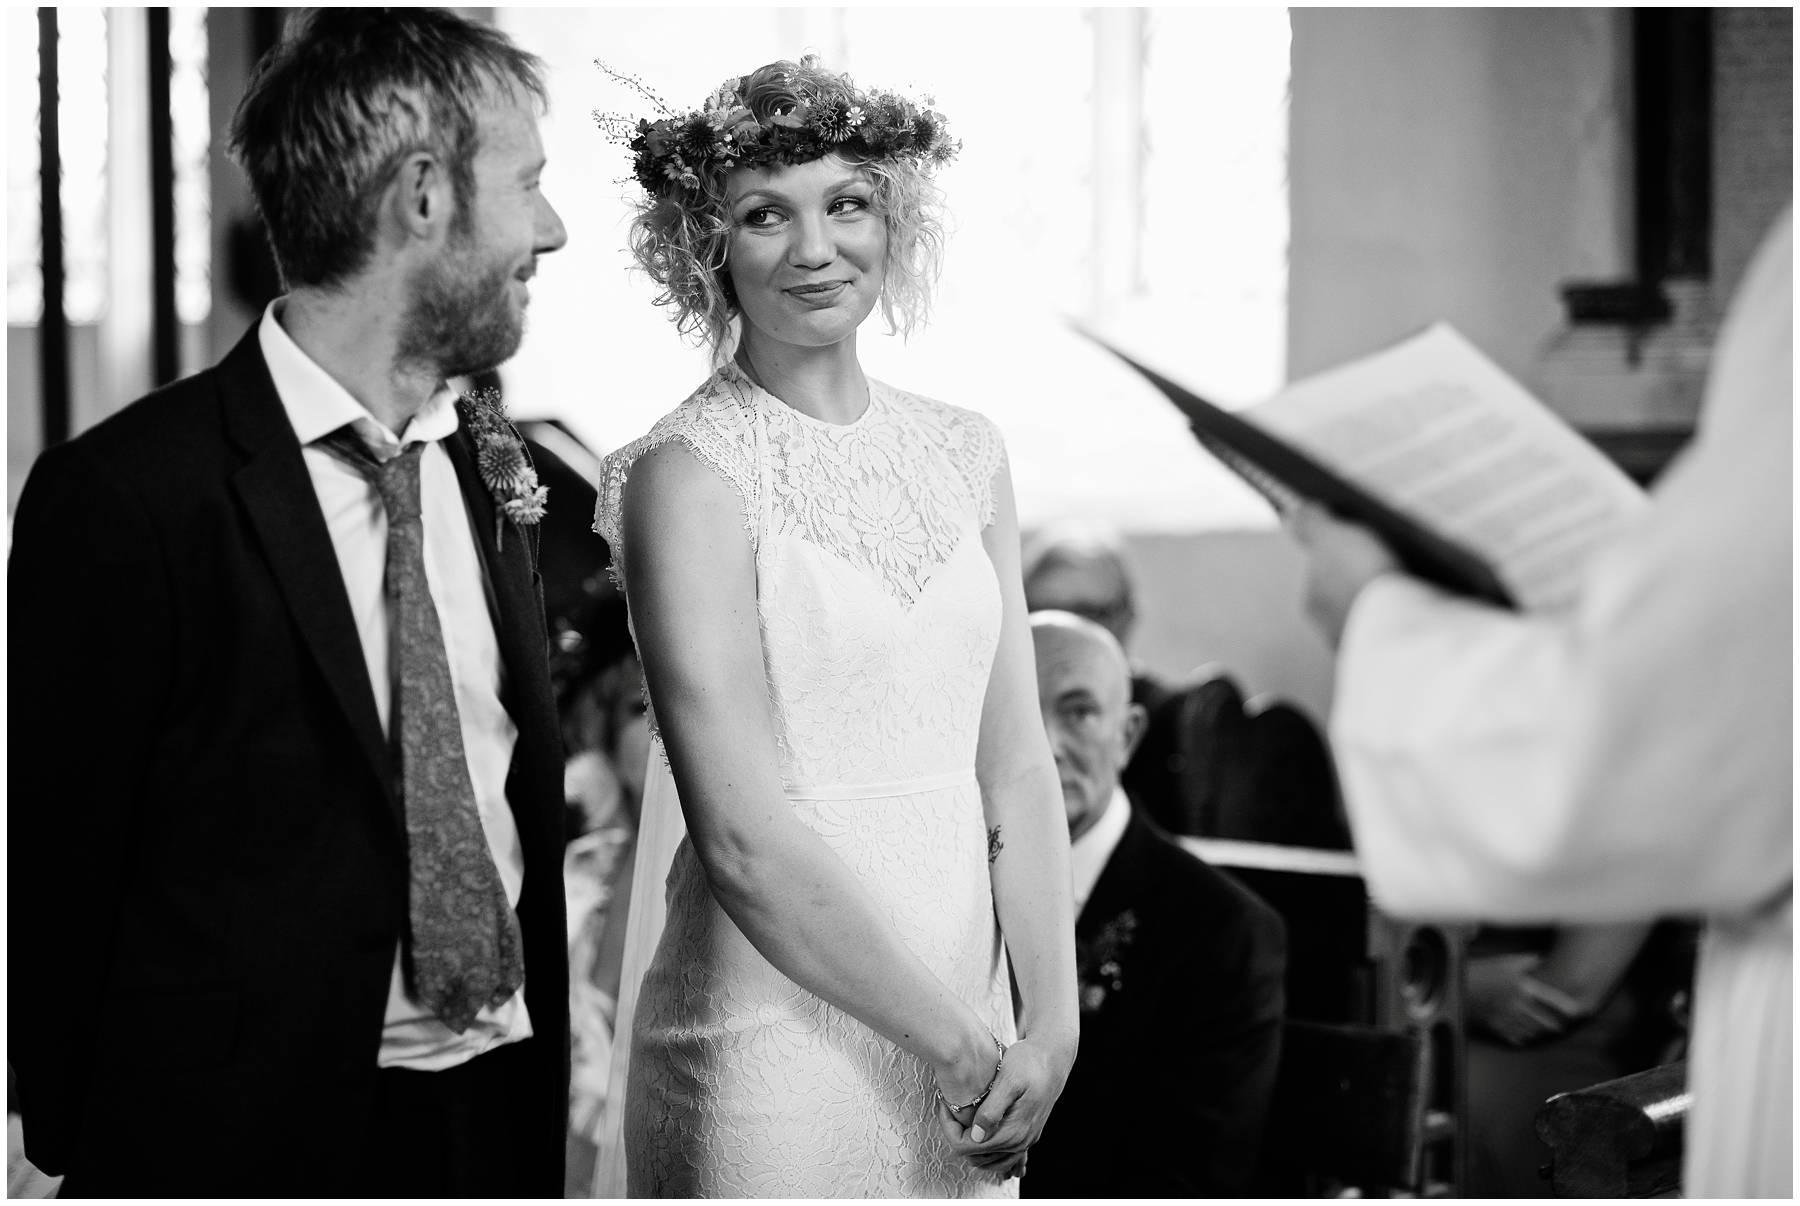 Bride and Groom at Essex church wedding